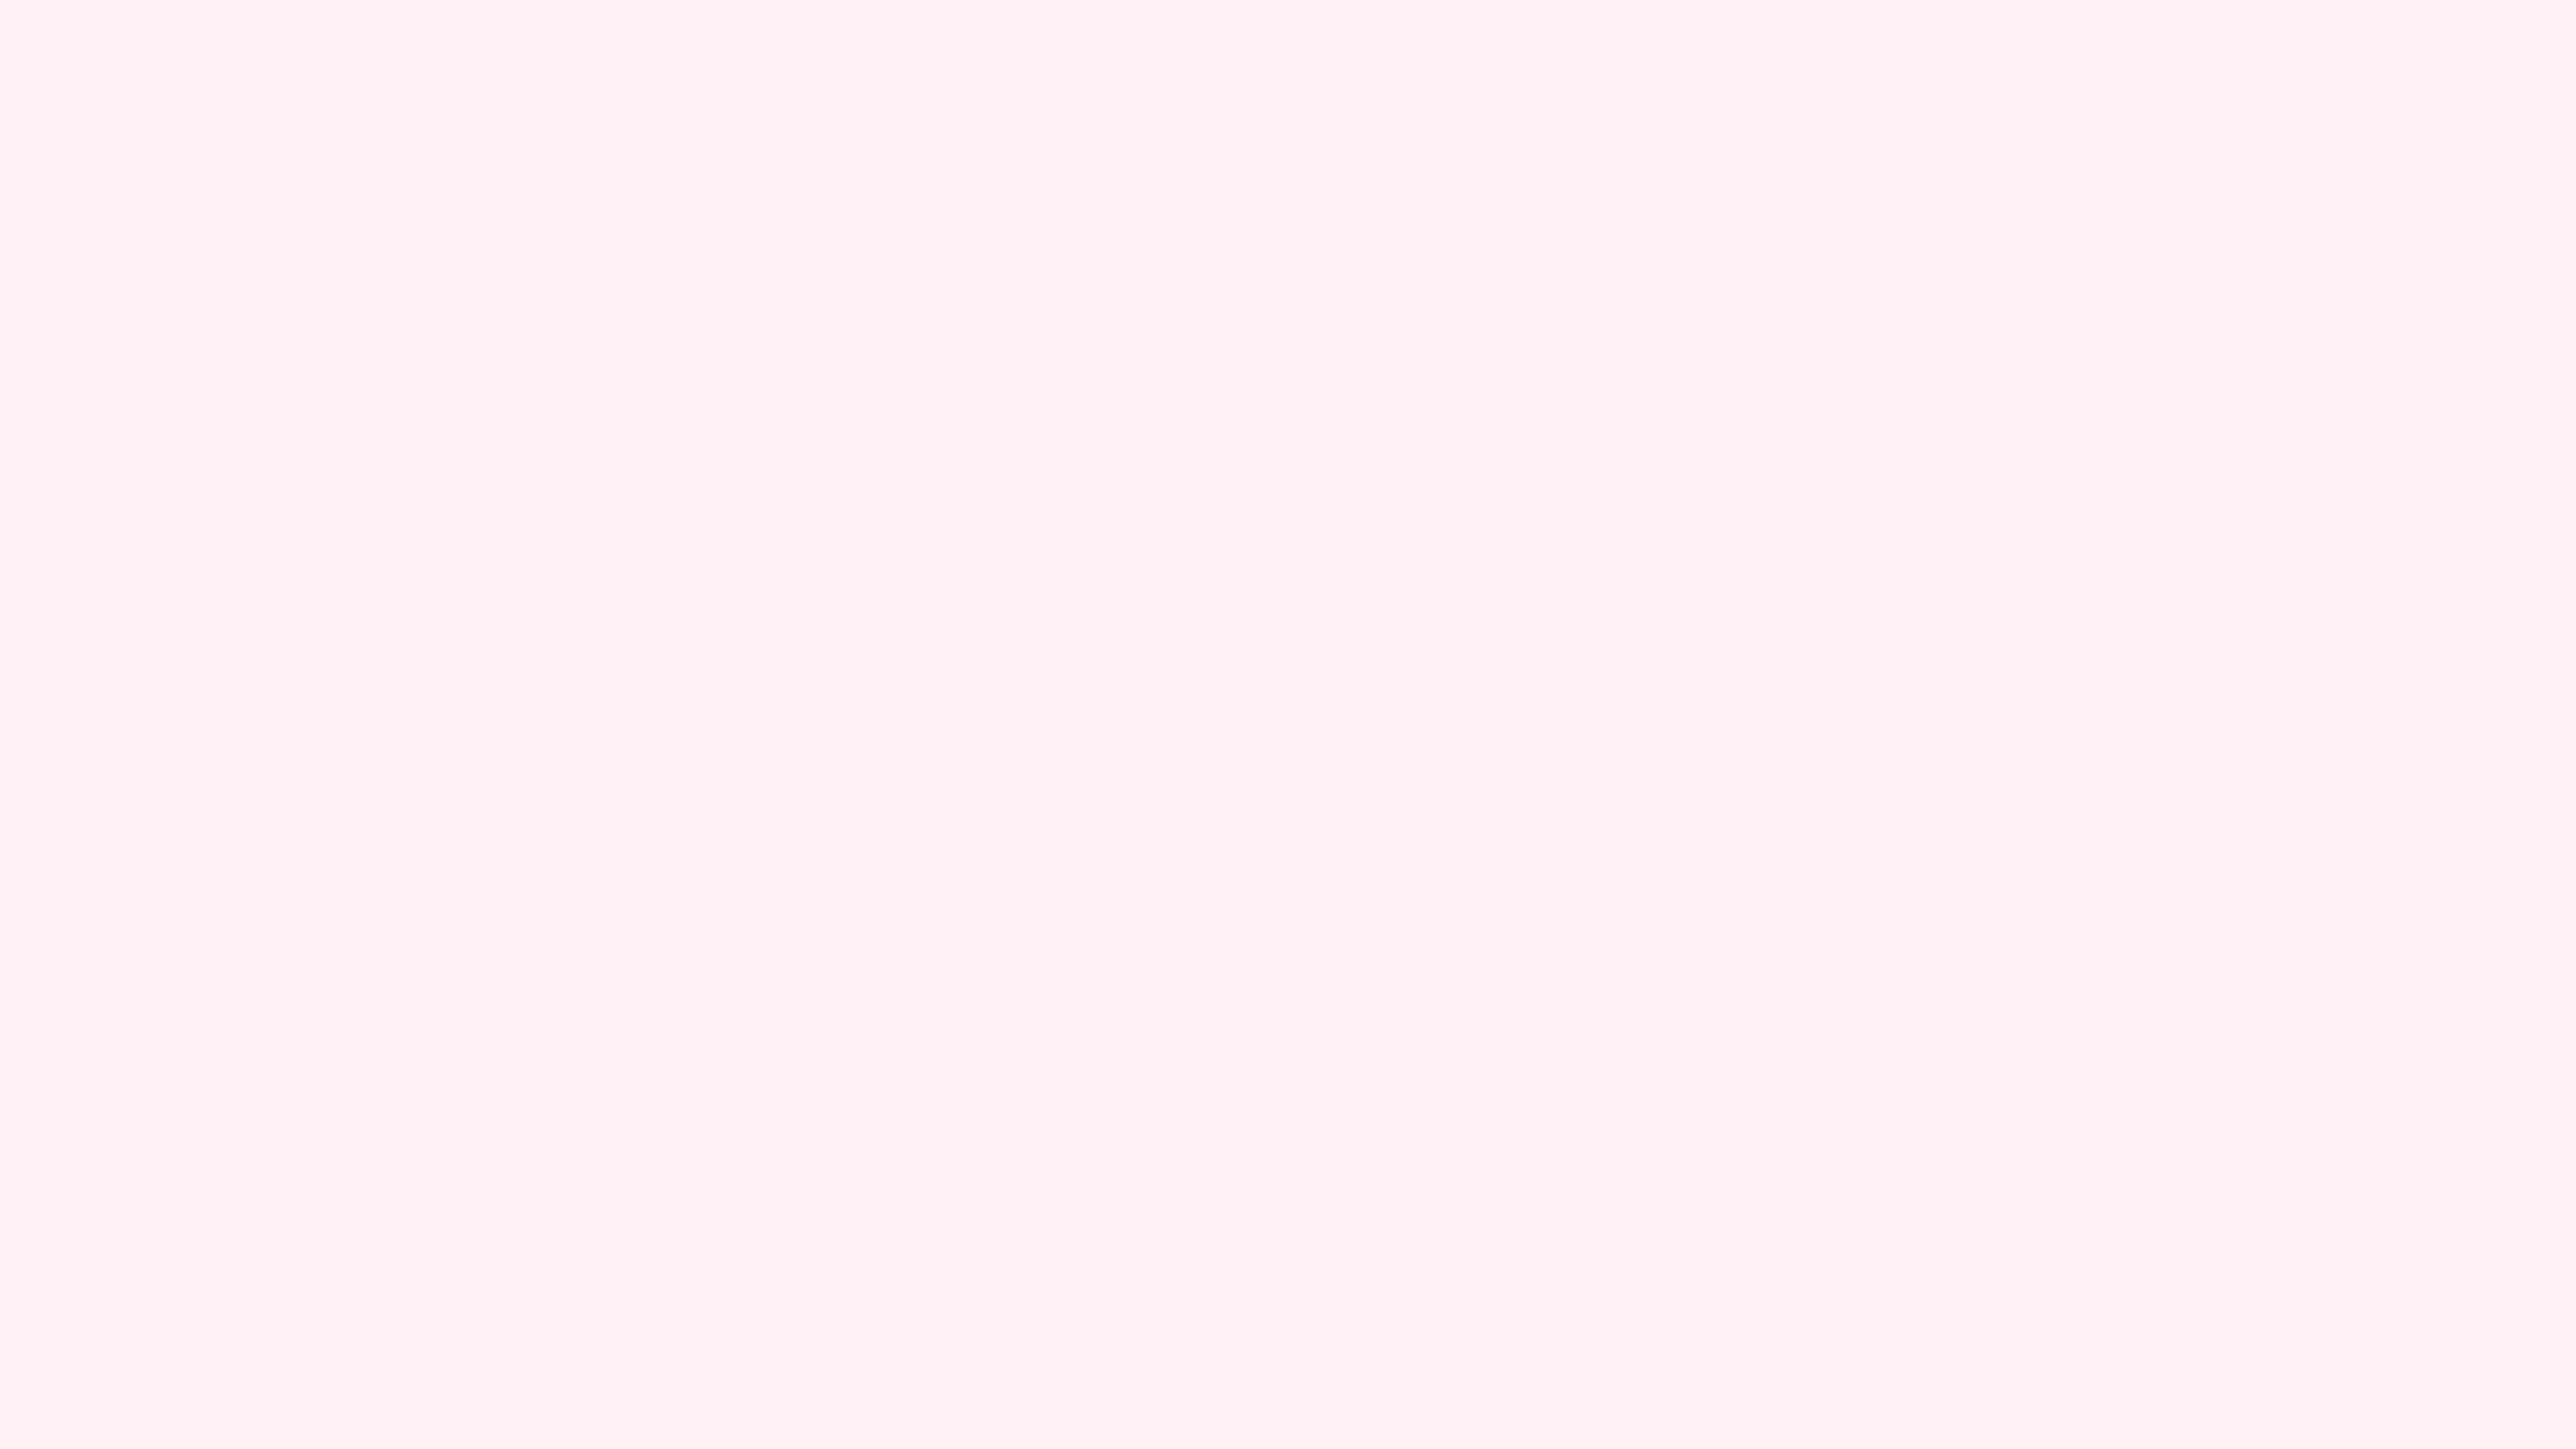 5120x2880 Lavender Blush Solid Color Background